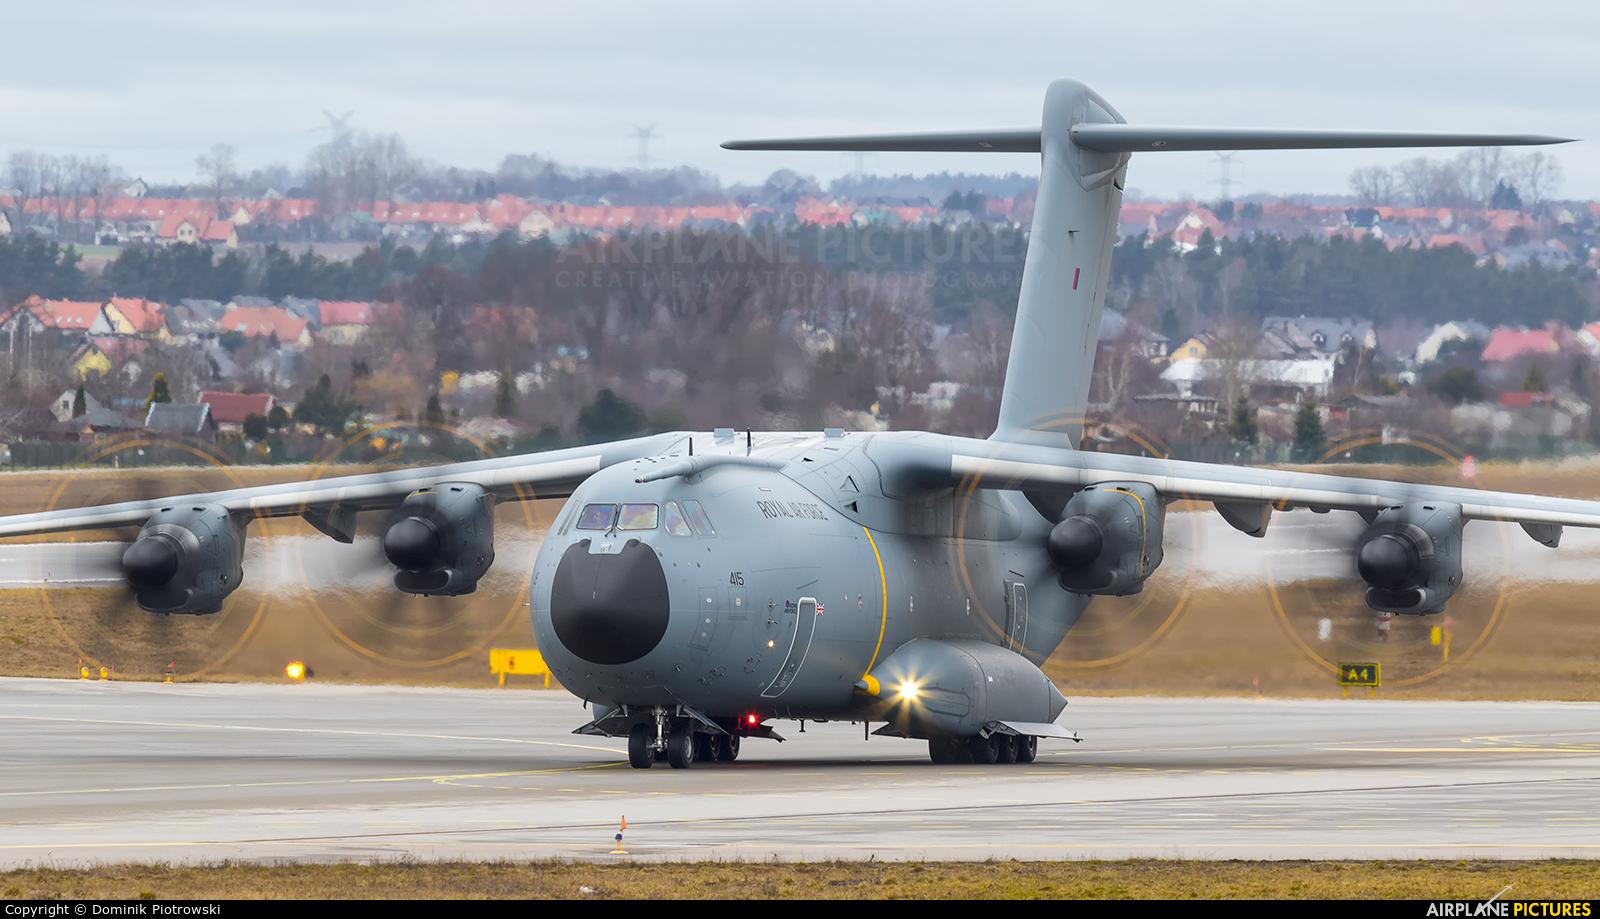 Royal Air Force ZM415 aircraft at Gdańsk - Lech Wałęsa